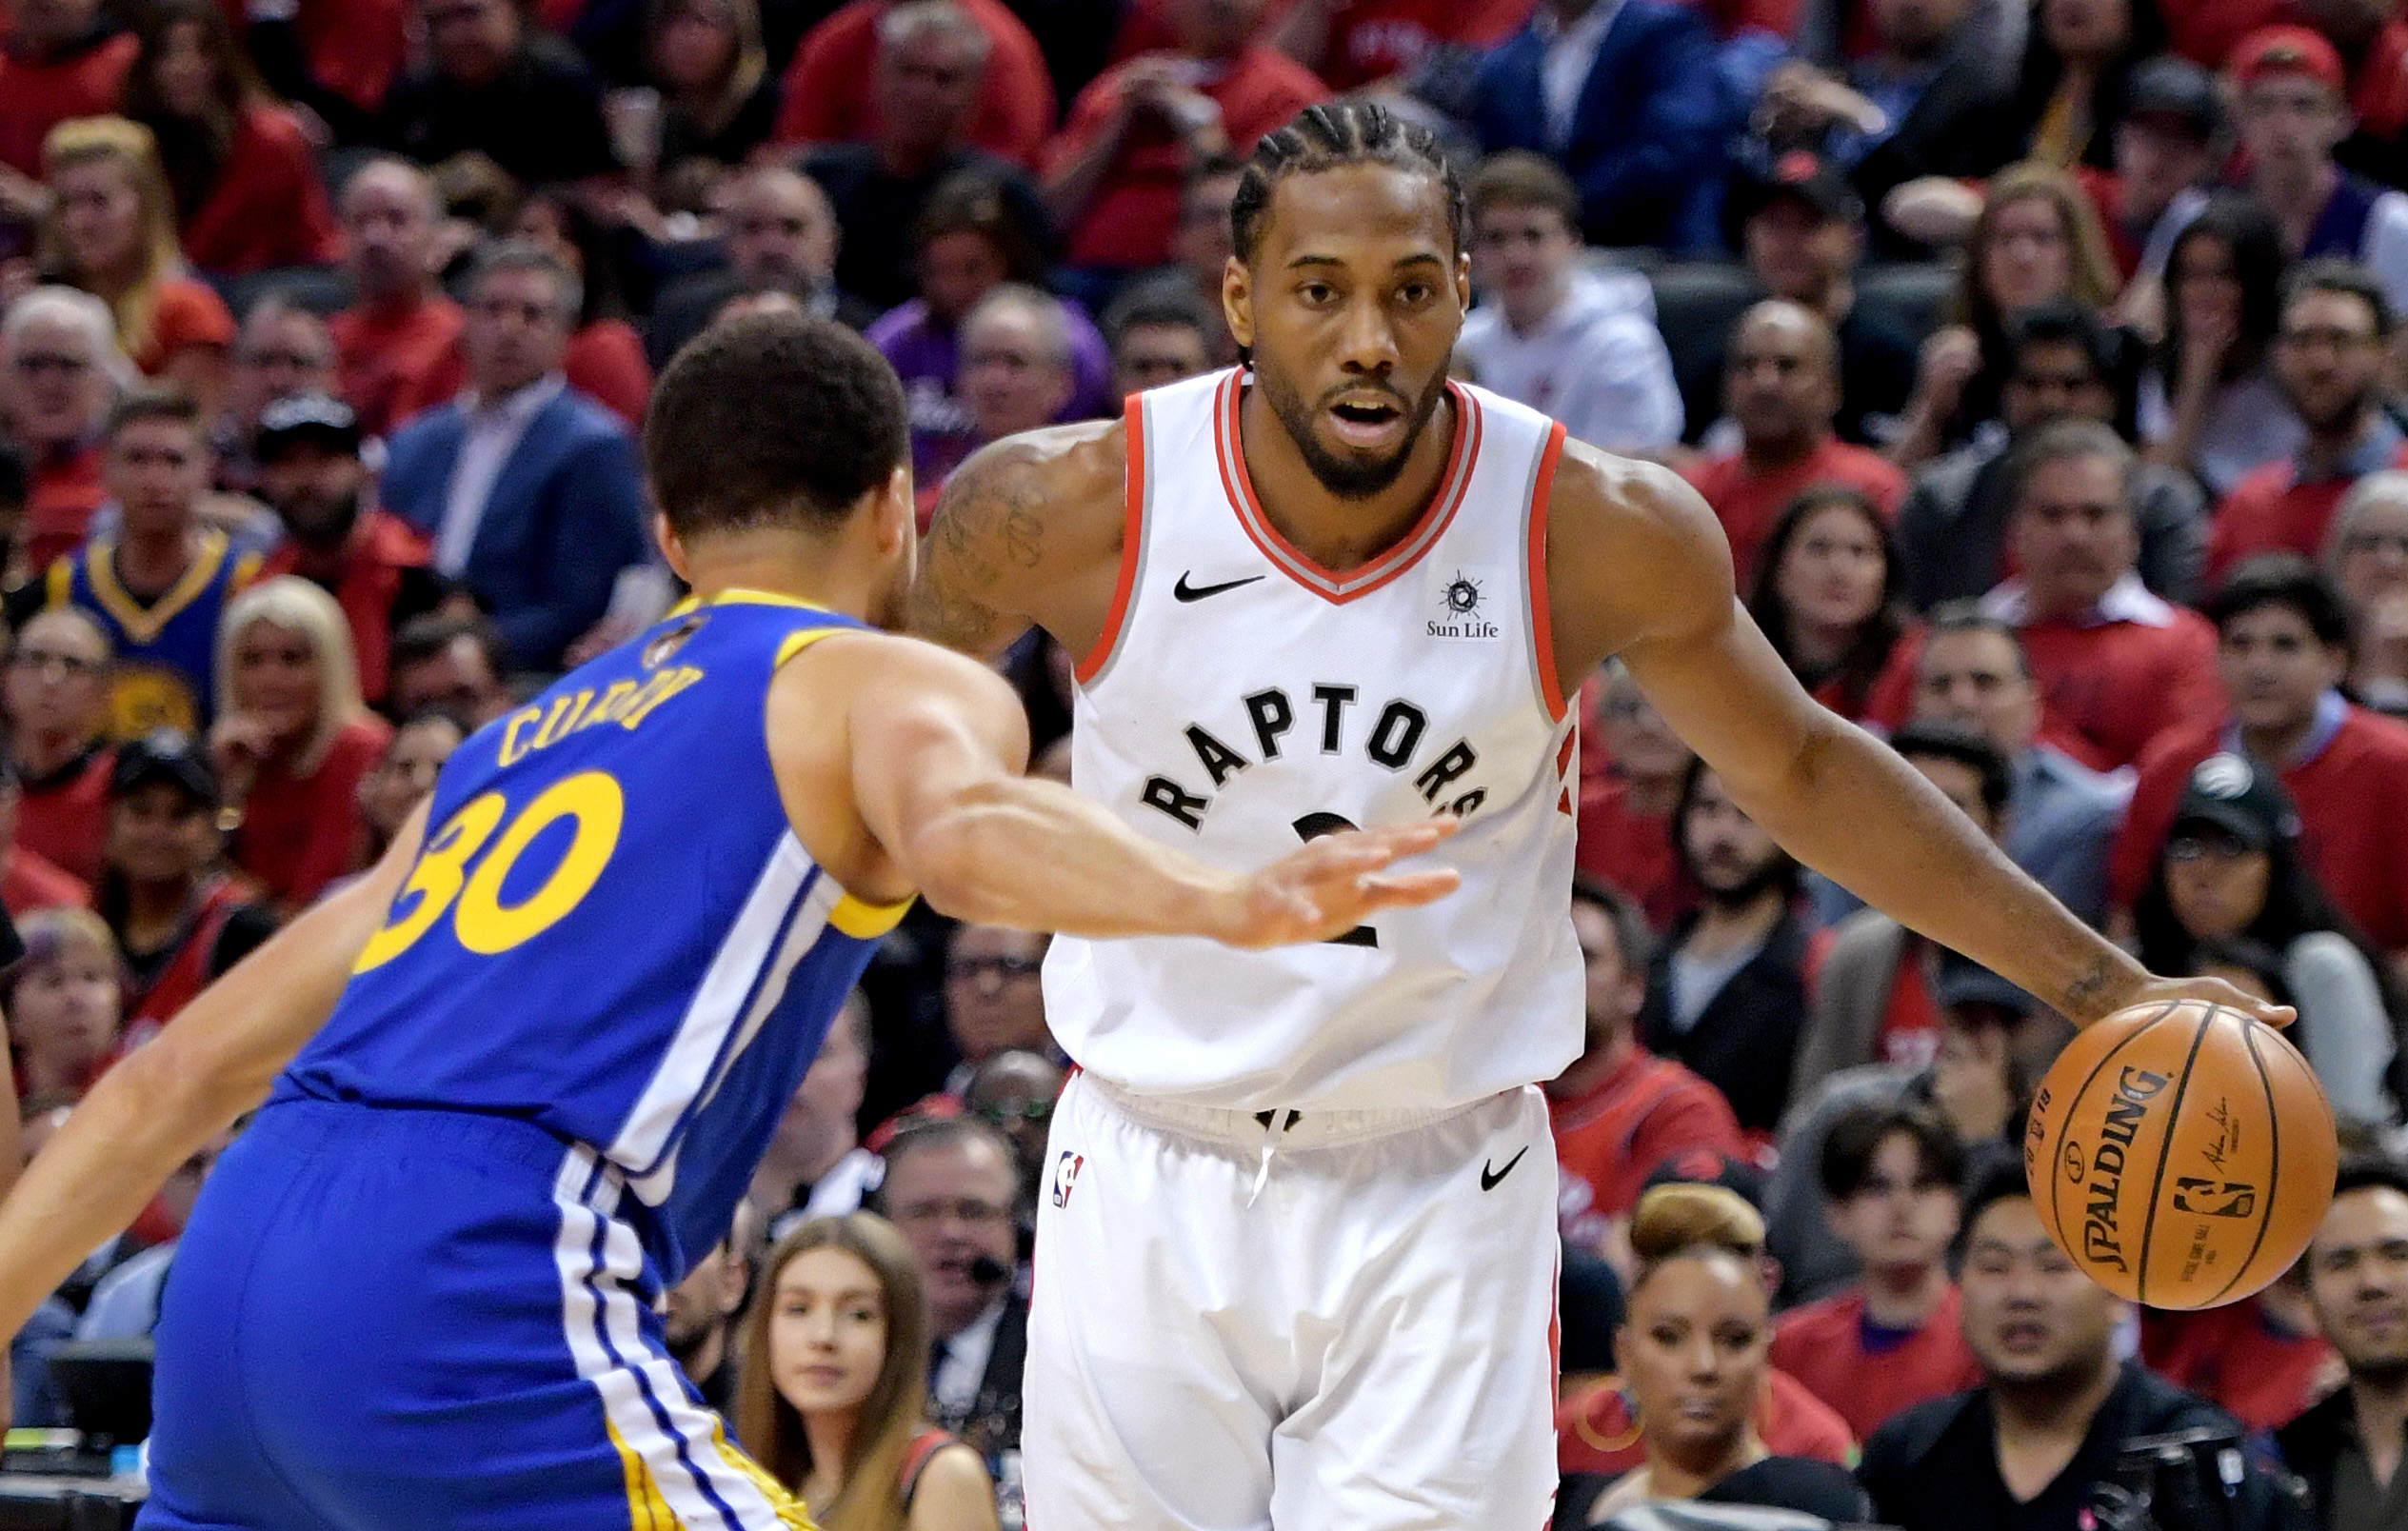 Kawhi Leonard gets funny Wikipedia edit to reflect NBA Finals dominance